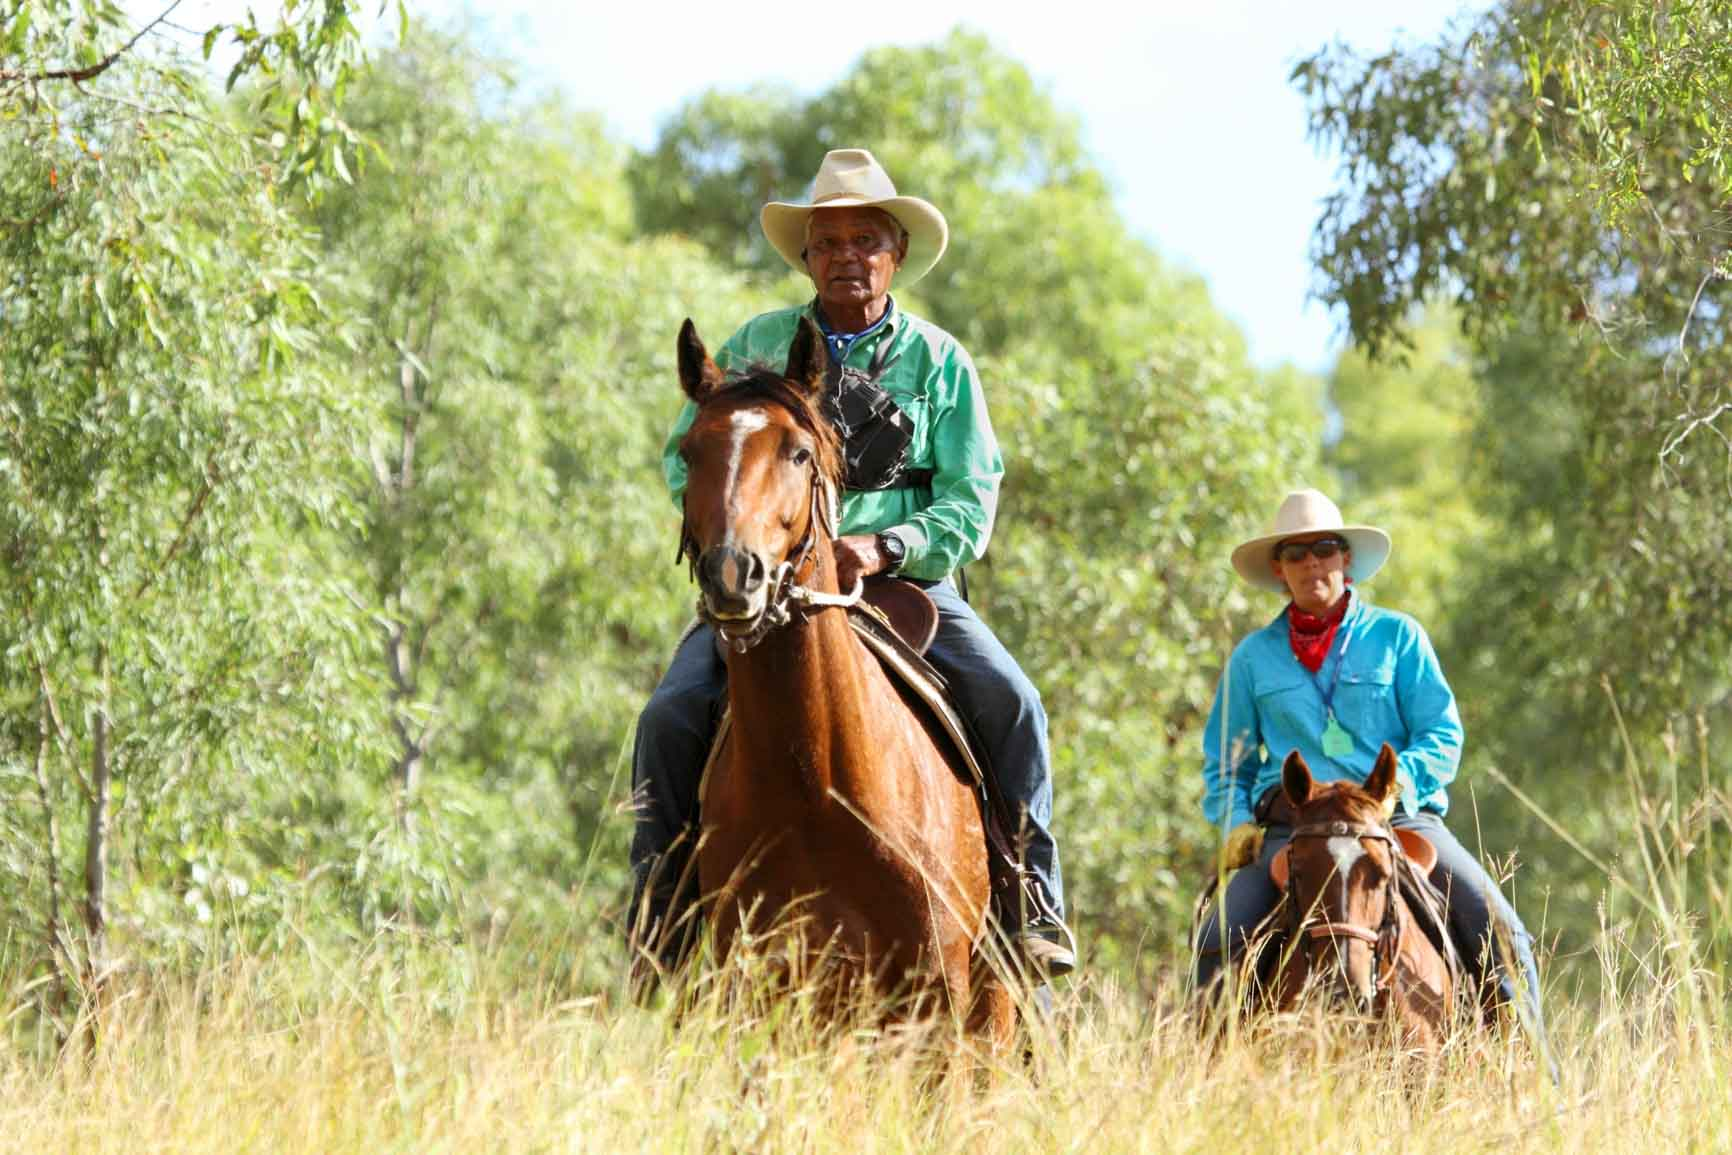 Two men of indigenous decent riding horses through Western Australian bush